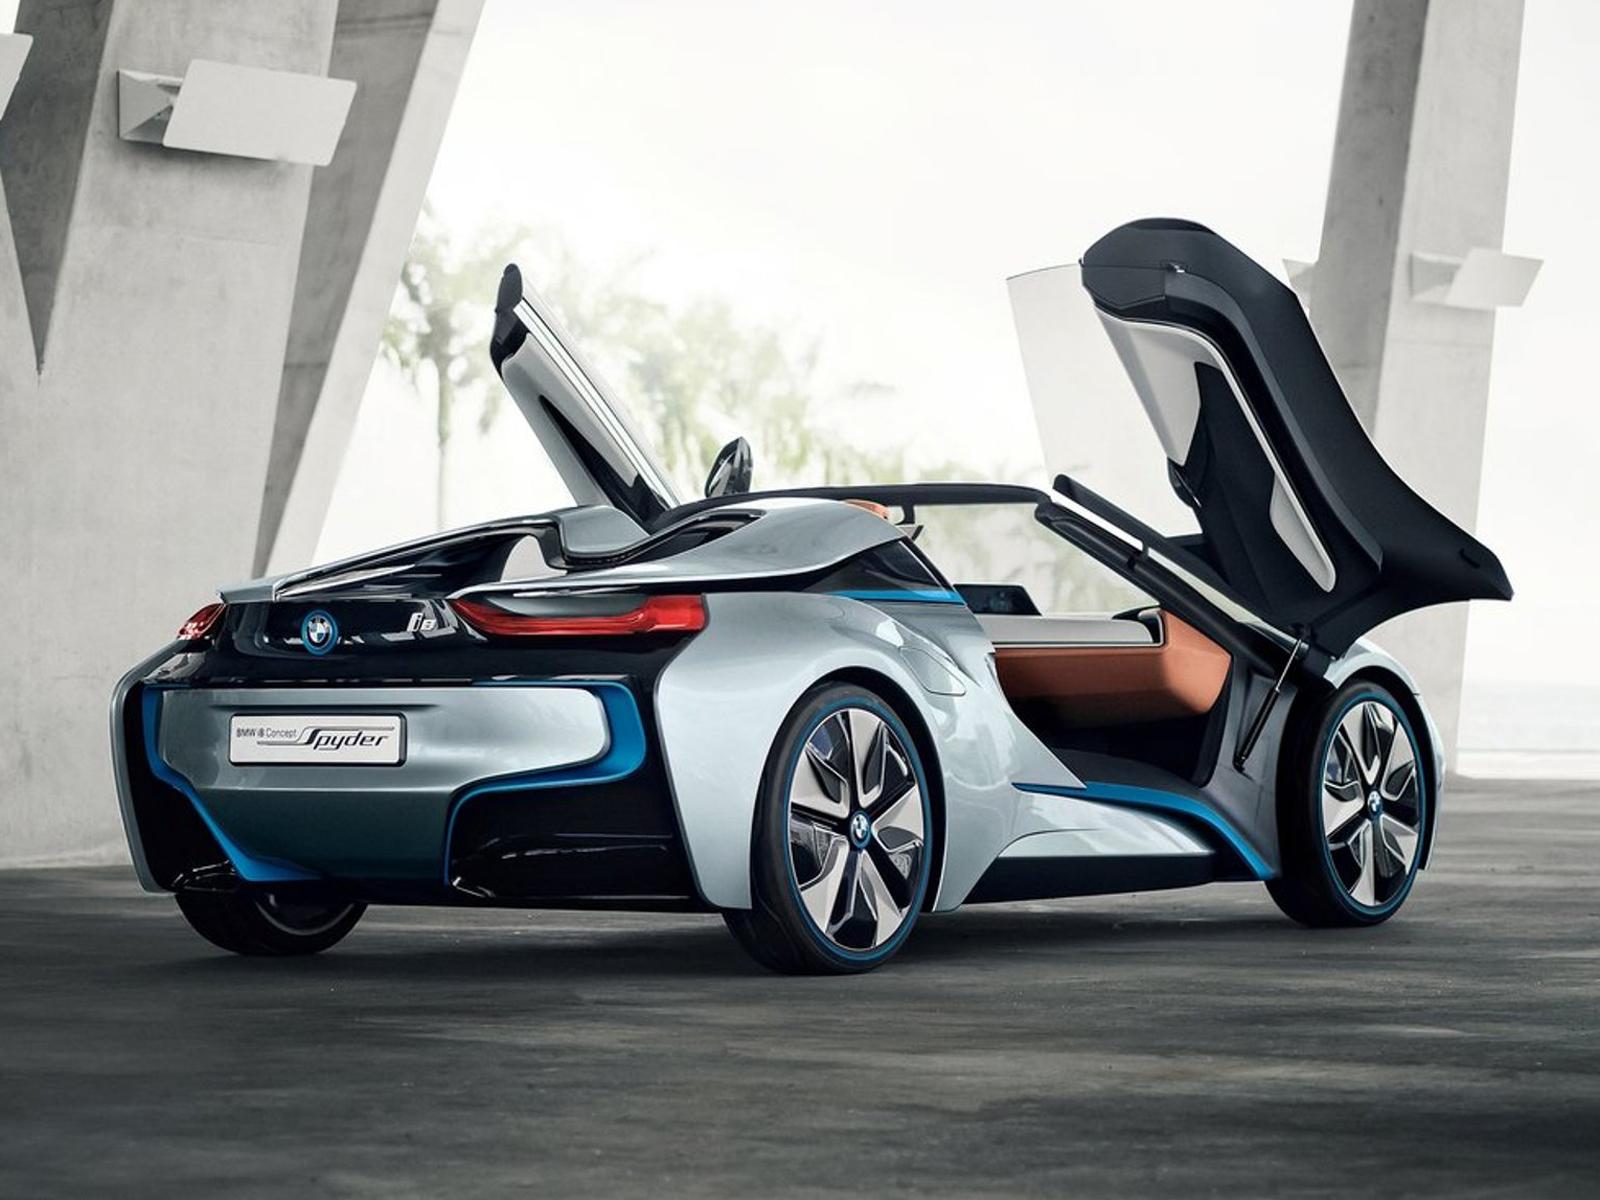 Exceptional Bmw Car 2013 Pics Design Ideas